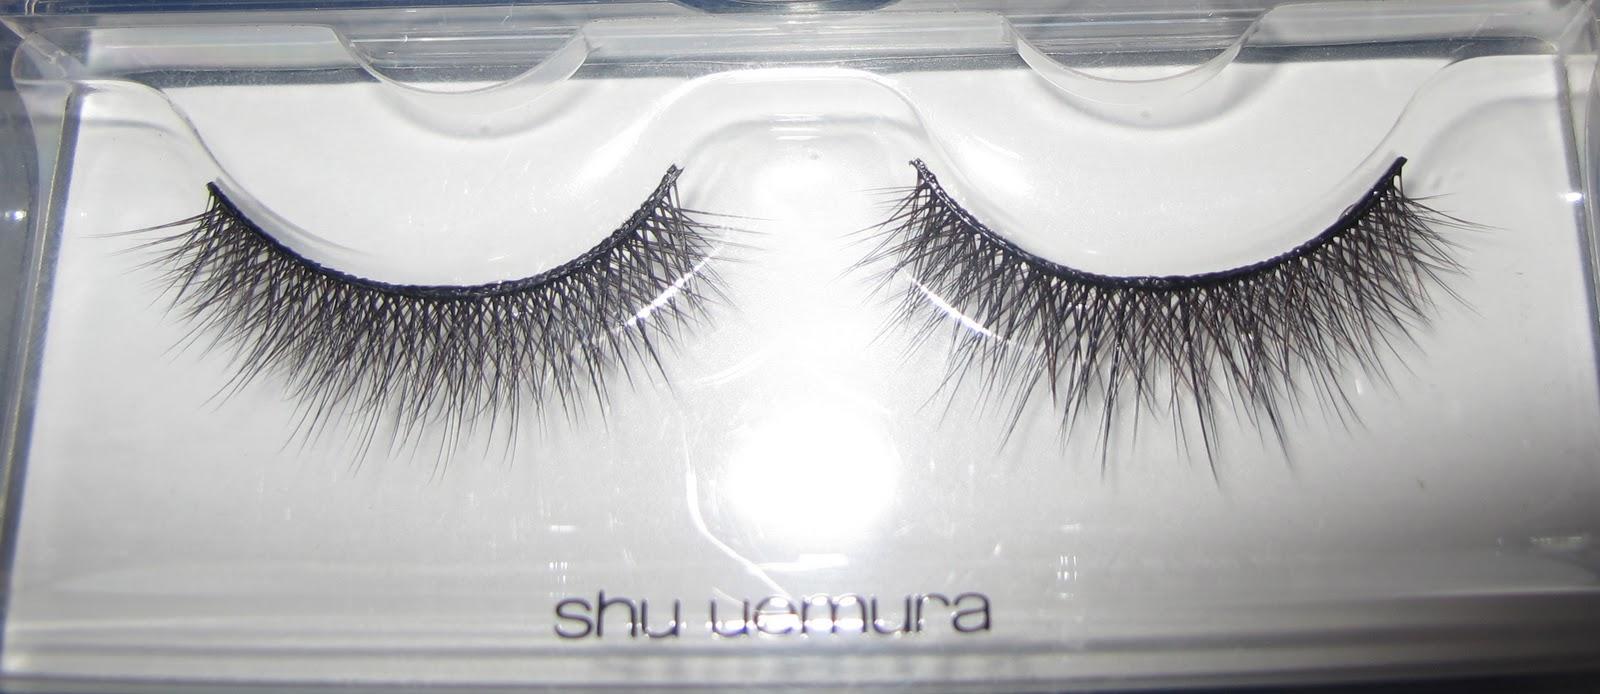 c0d0c796742 the black panties: Shu Uemura Smoky Layers false eyelashes